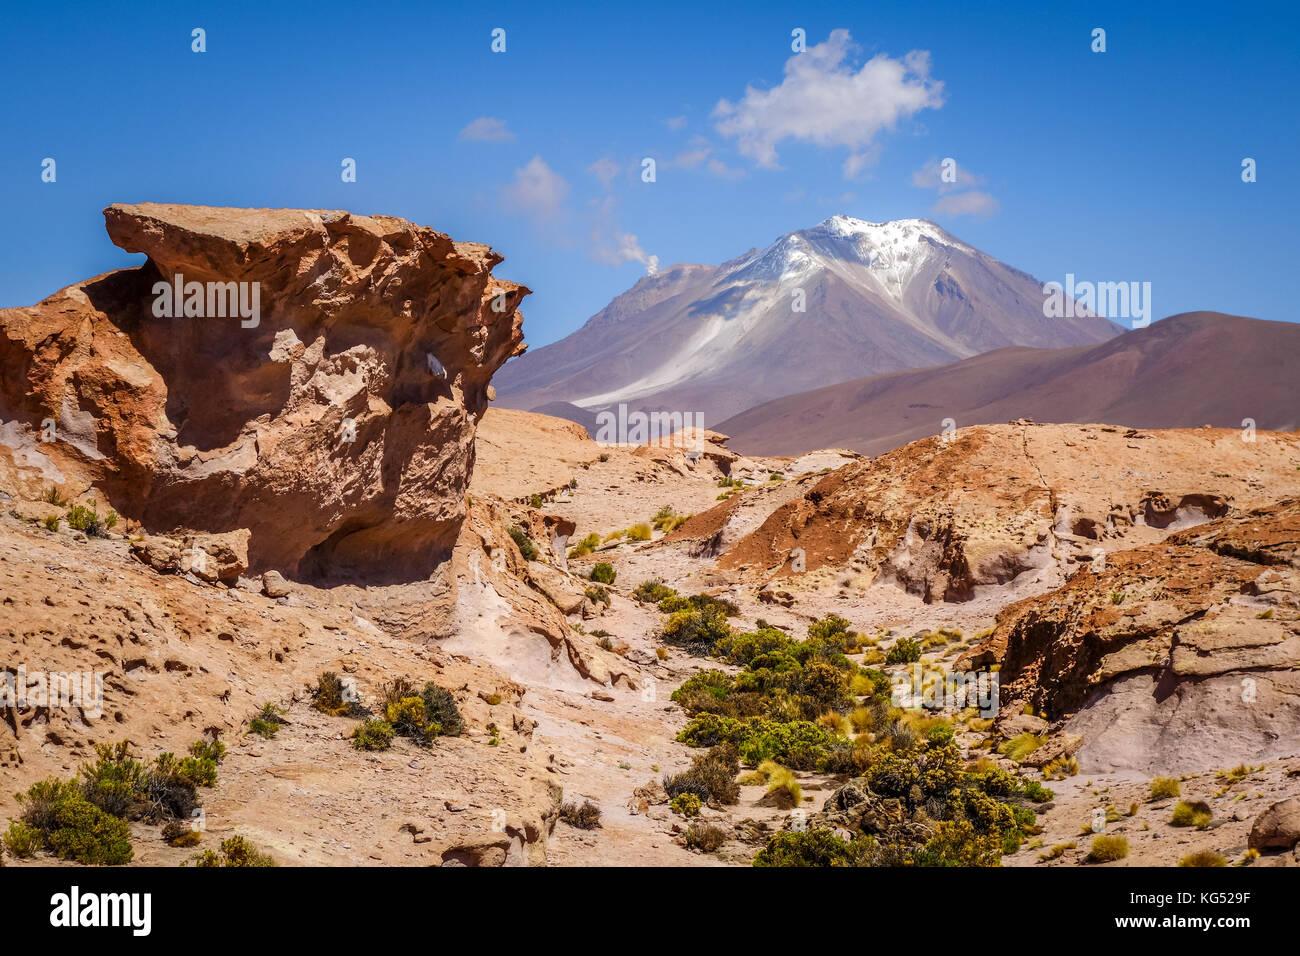 Mountains and desert landscape in sud lipez altiplano, Bolivia - Stock Image